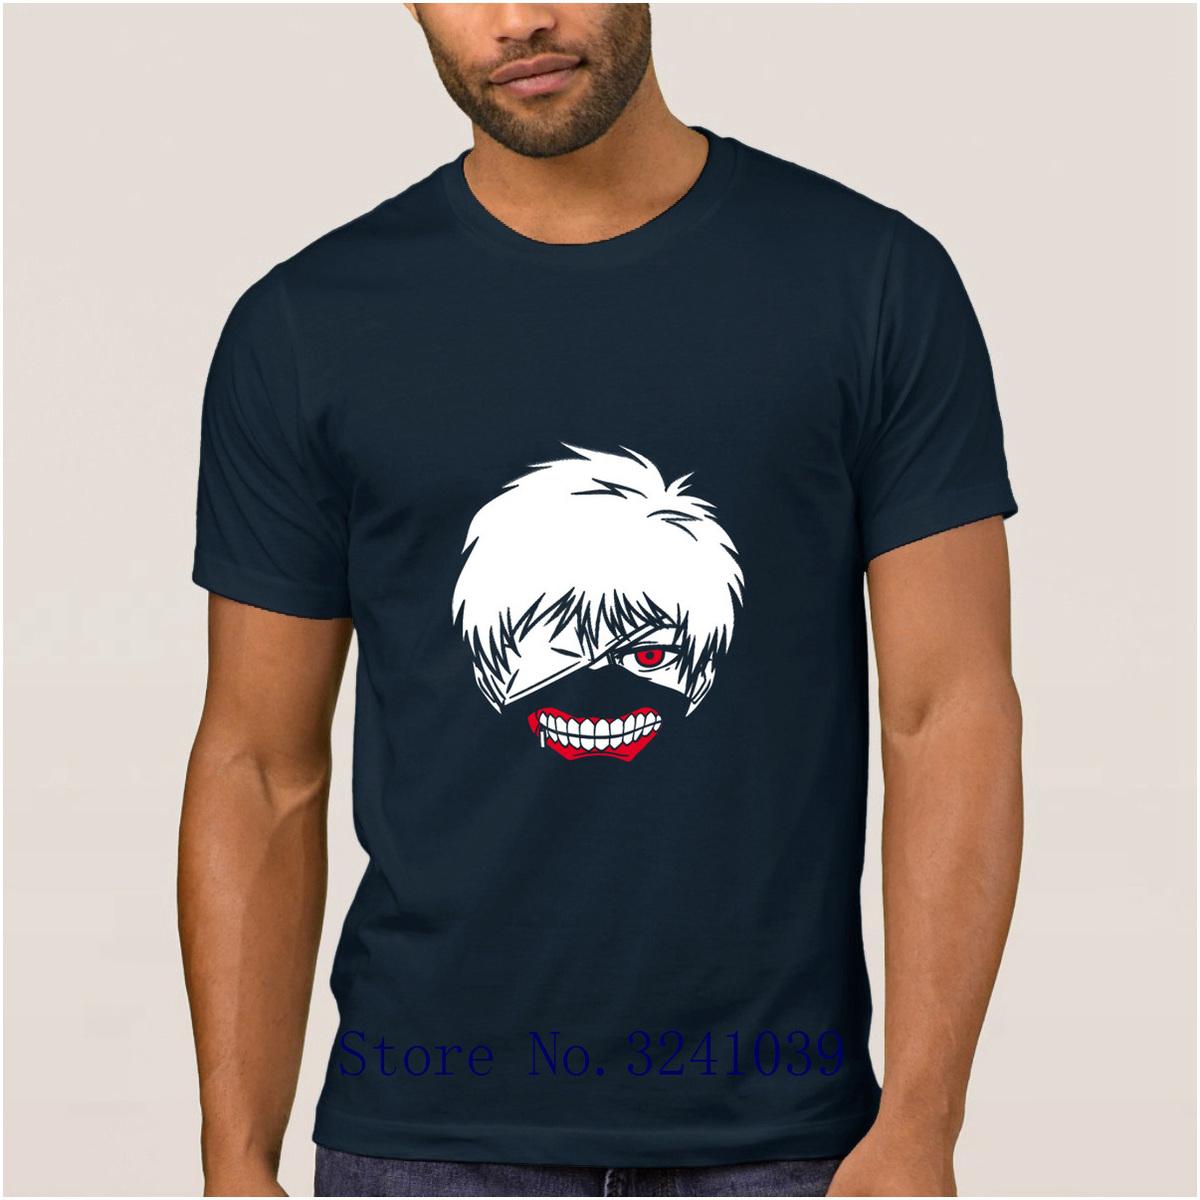 La Maxpa Knitted Casual hit contrast collar Anime Cartoon t shirt for men 2017 Top Quality t-shirt Leisure tshirt mens